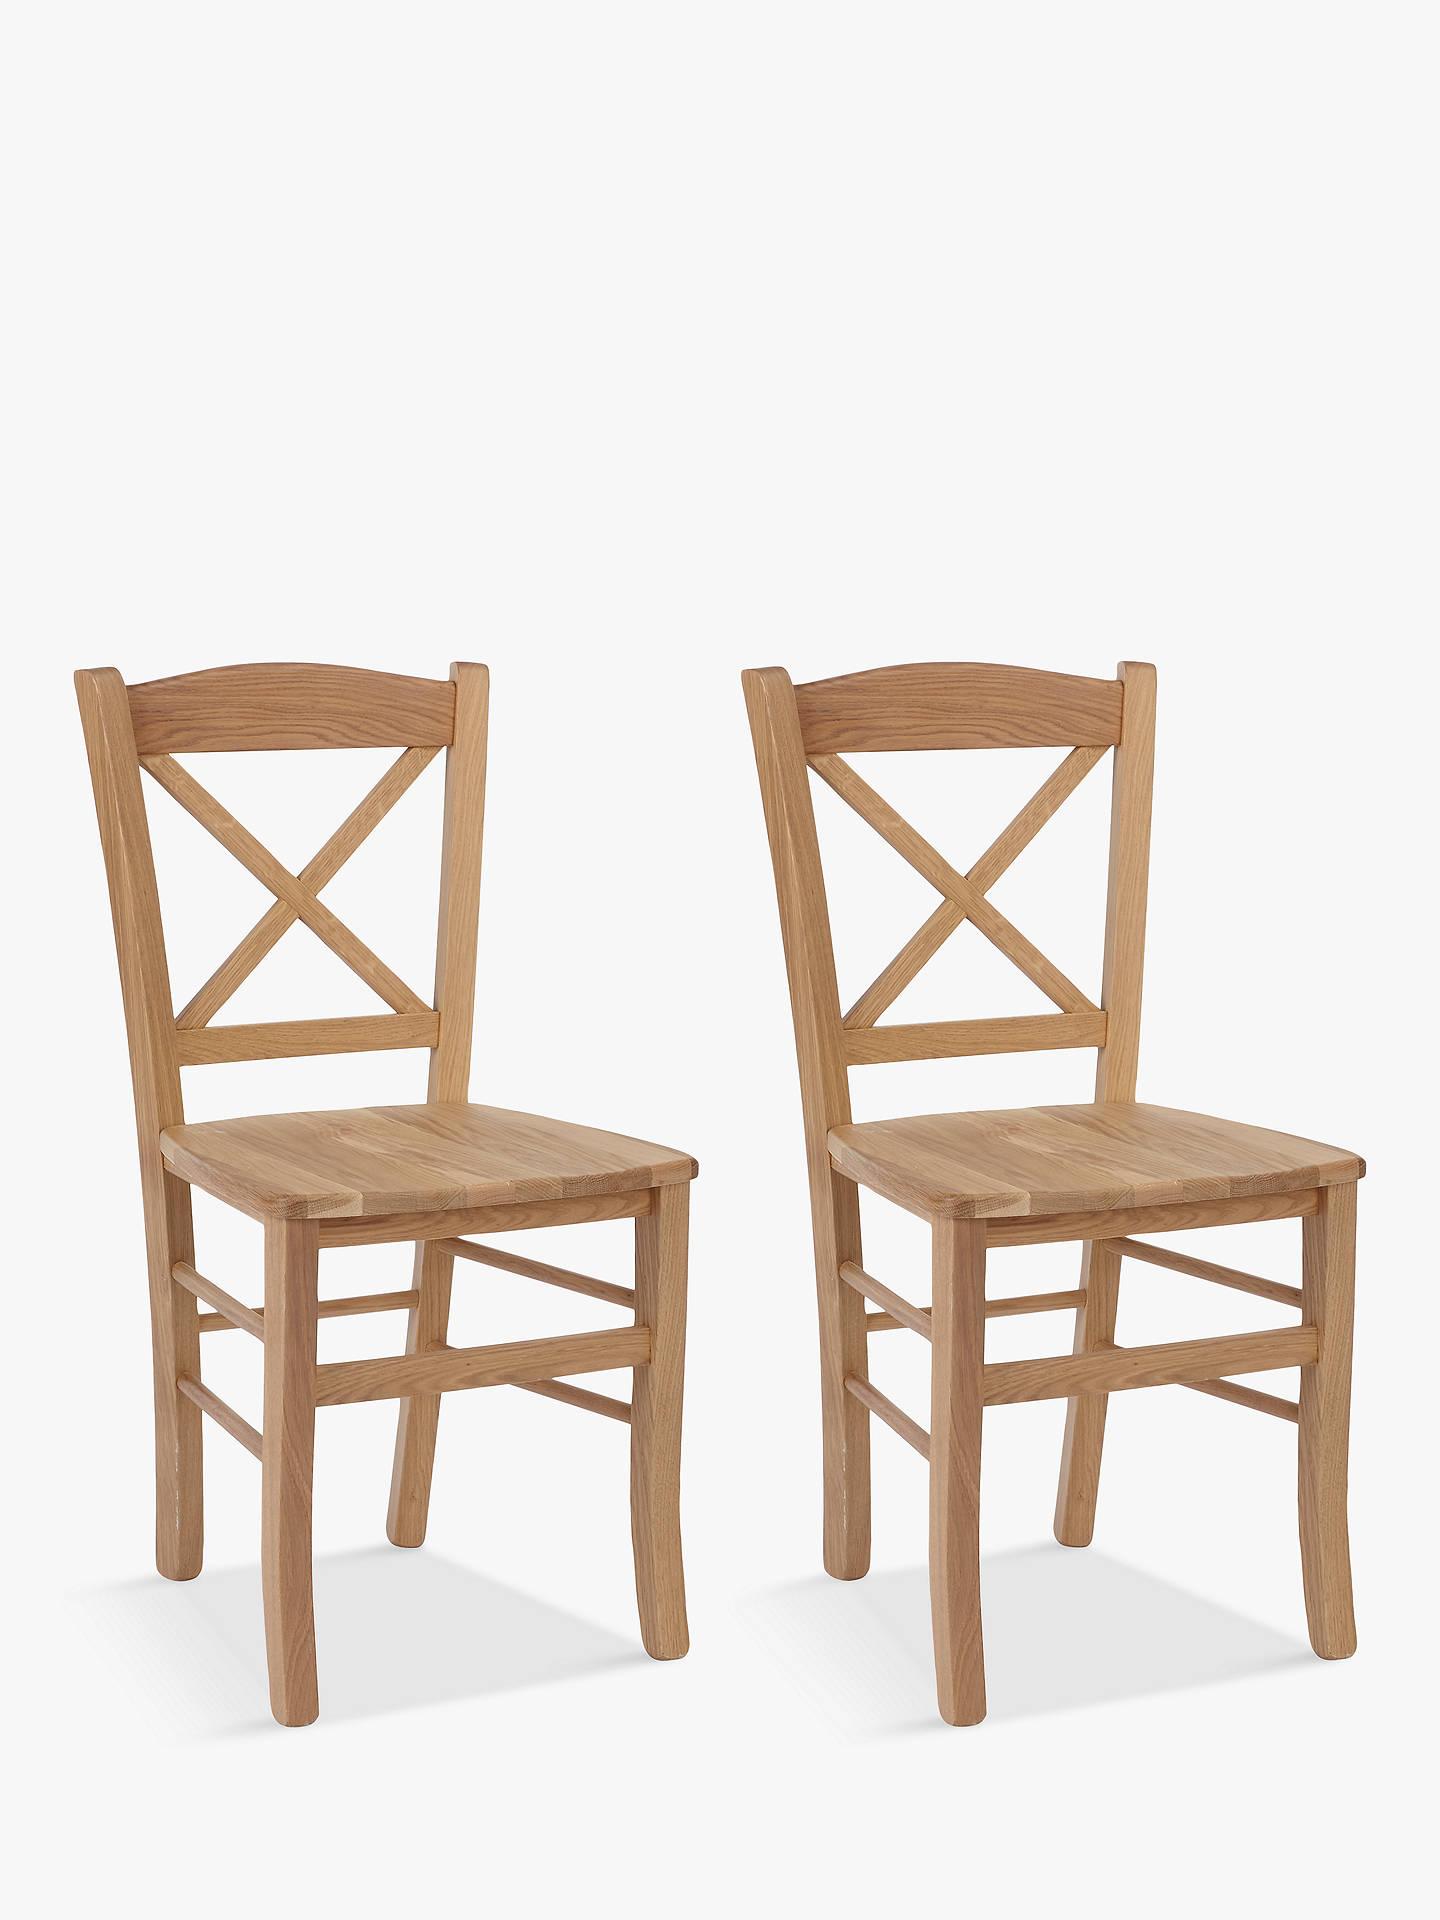 Astounding John Lewis Partners Clayton Dining Chairs Set Of 2 Fsc Certified Oak Cjindustries Chair Design For Home Cjindustriesco